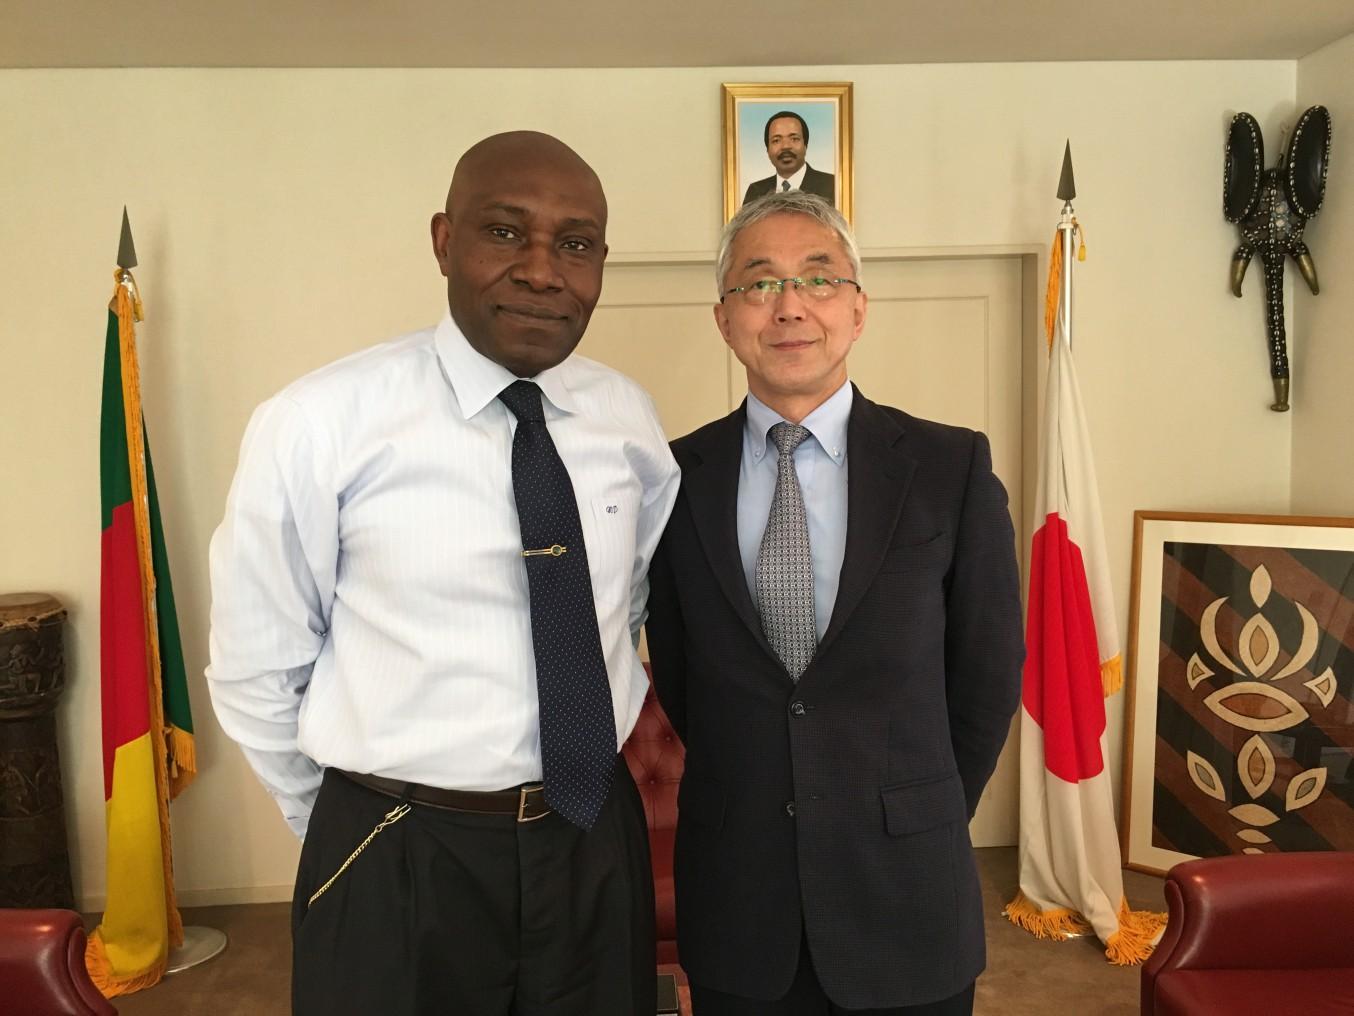 Meeting with Mr. Tada Miyakoshi from TFI on 18 May 2016